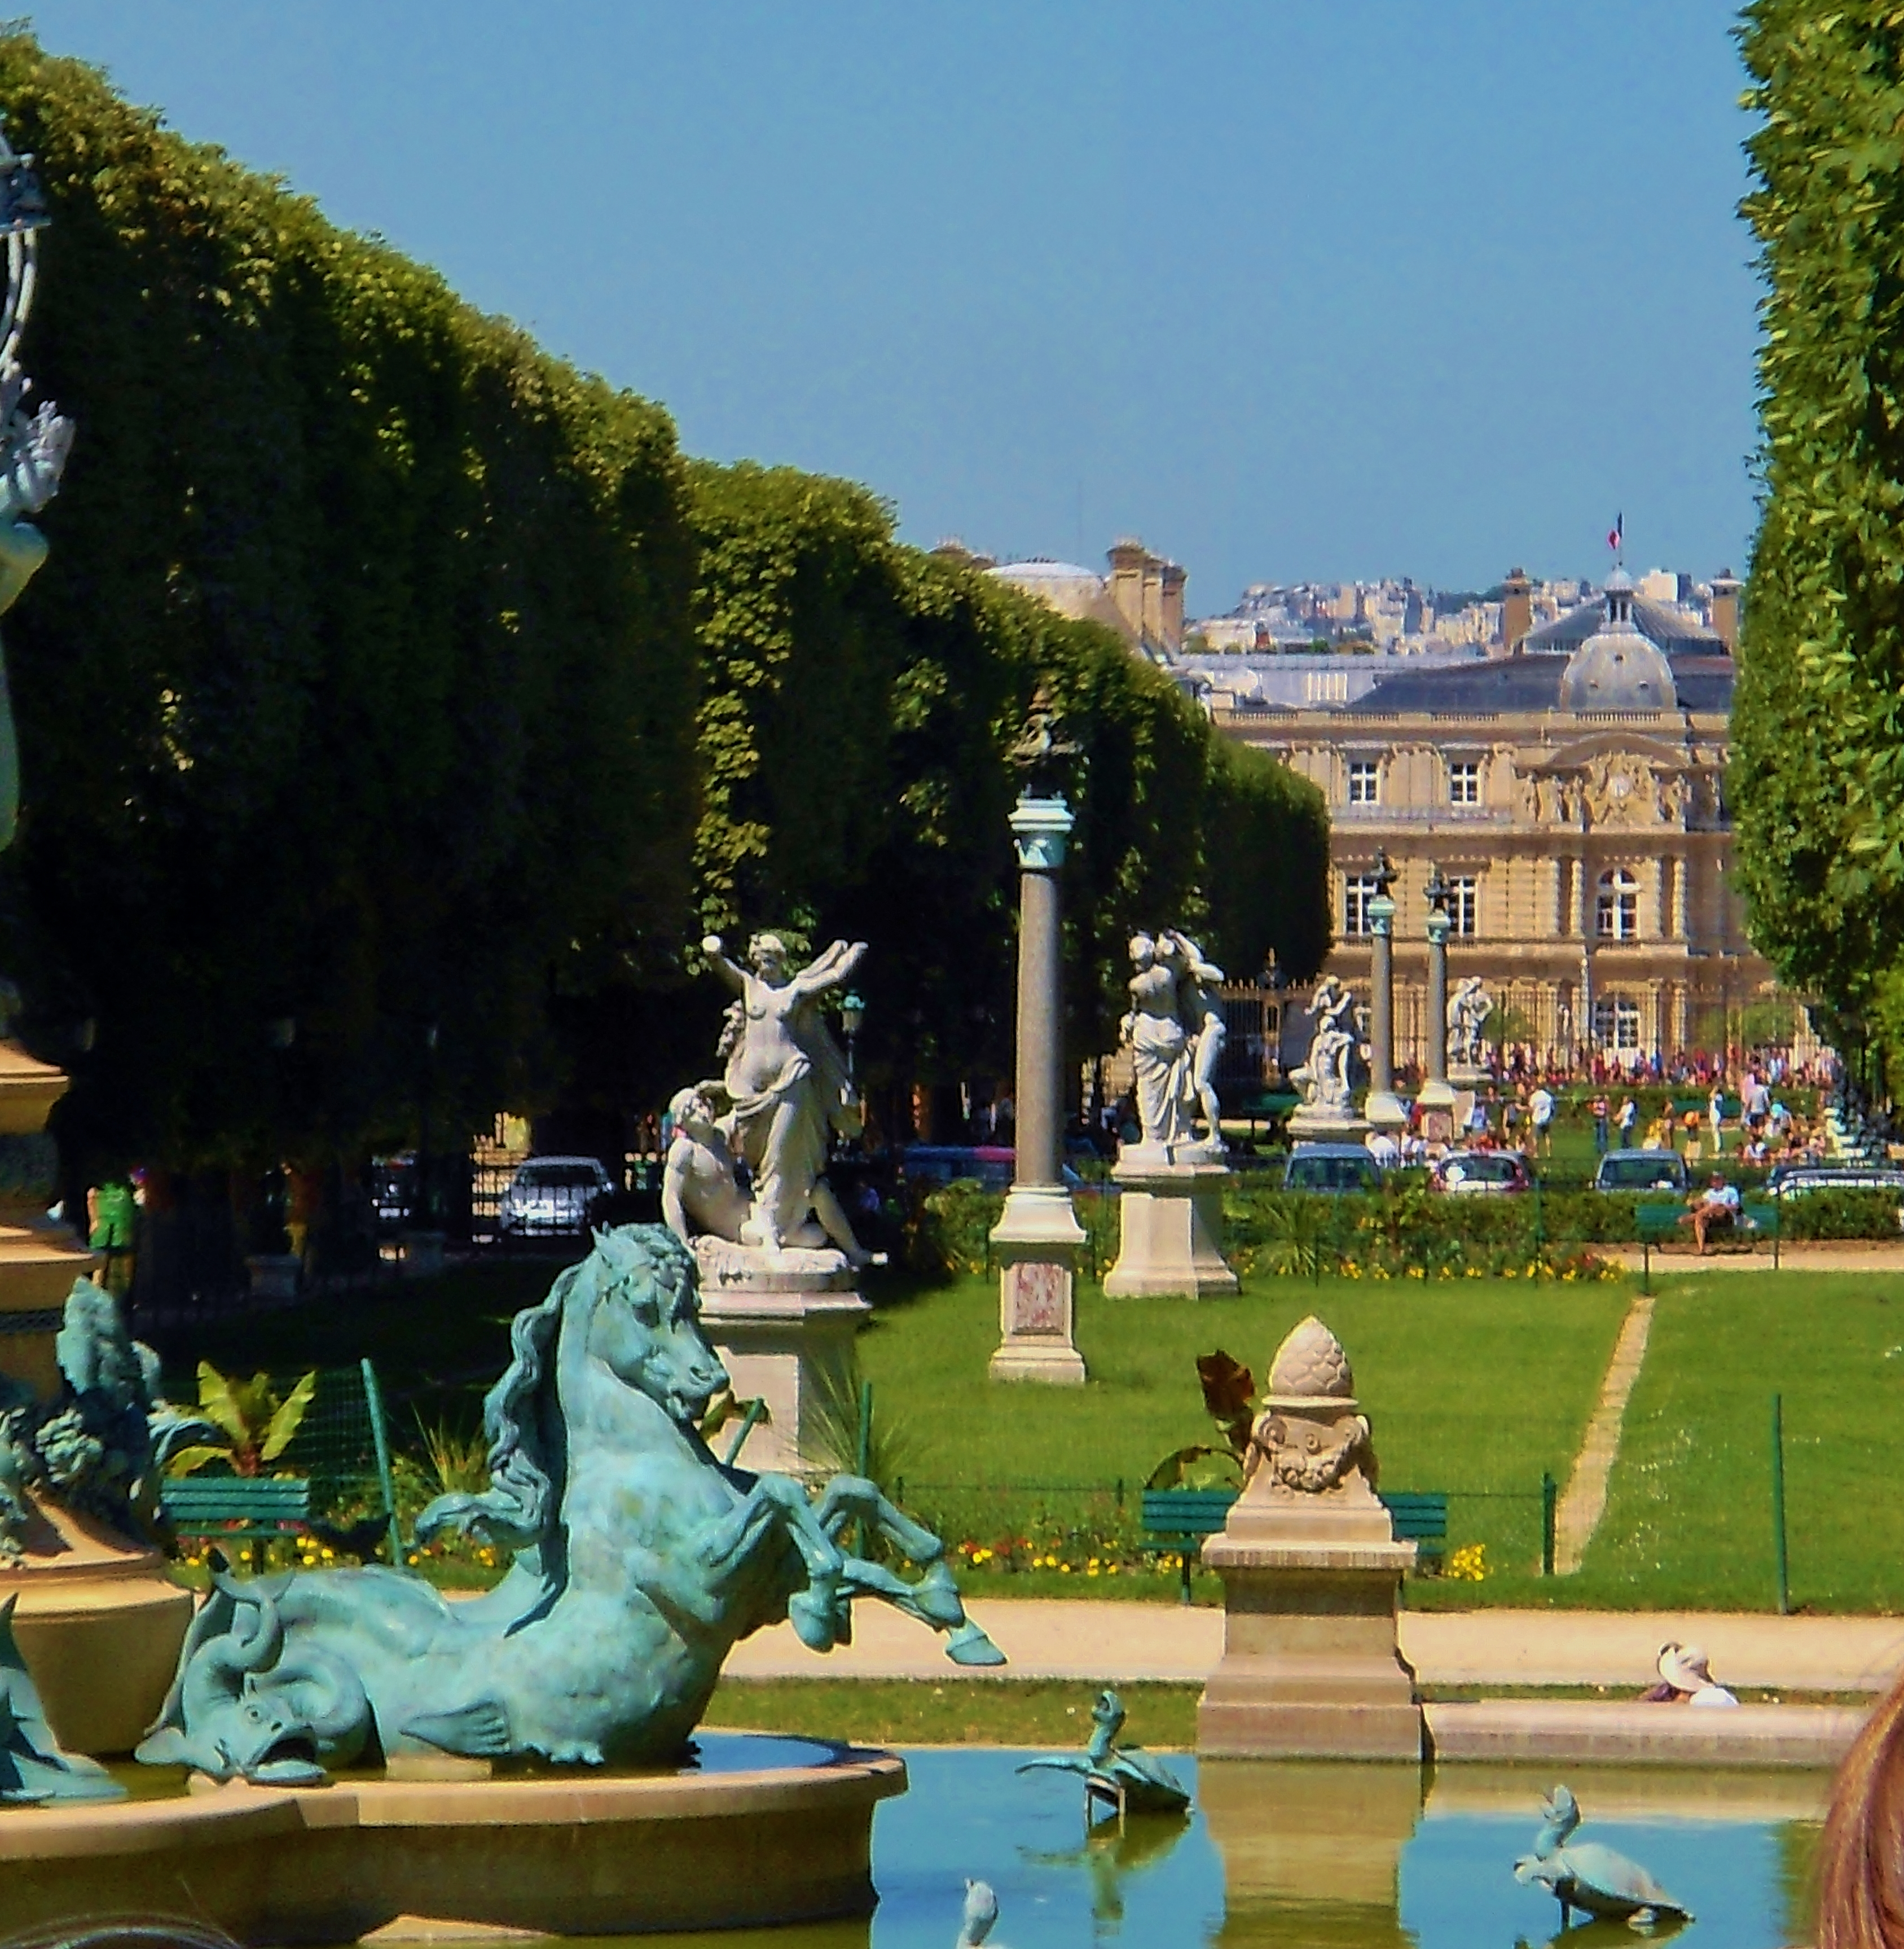 File:Jardin Marco-Polo, Paris 26 June 2011.jpg - Wikimedia Commons